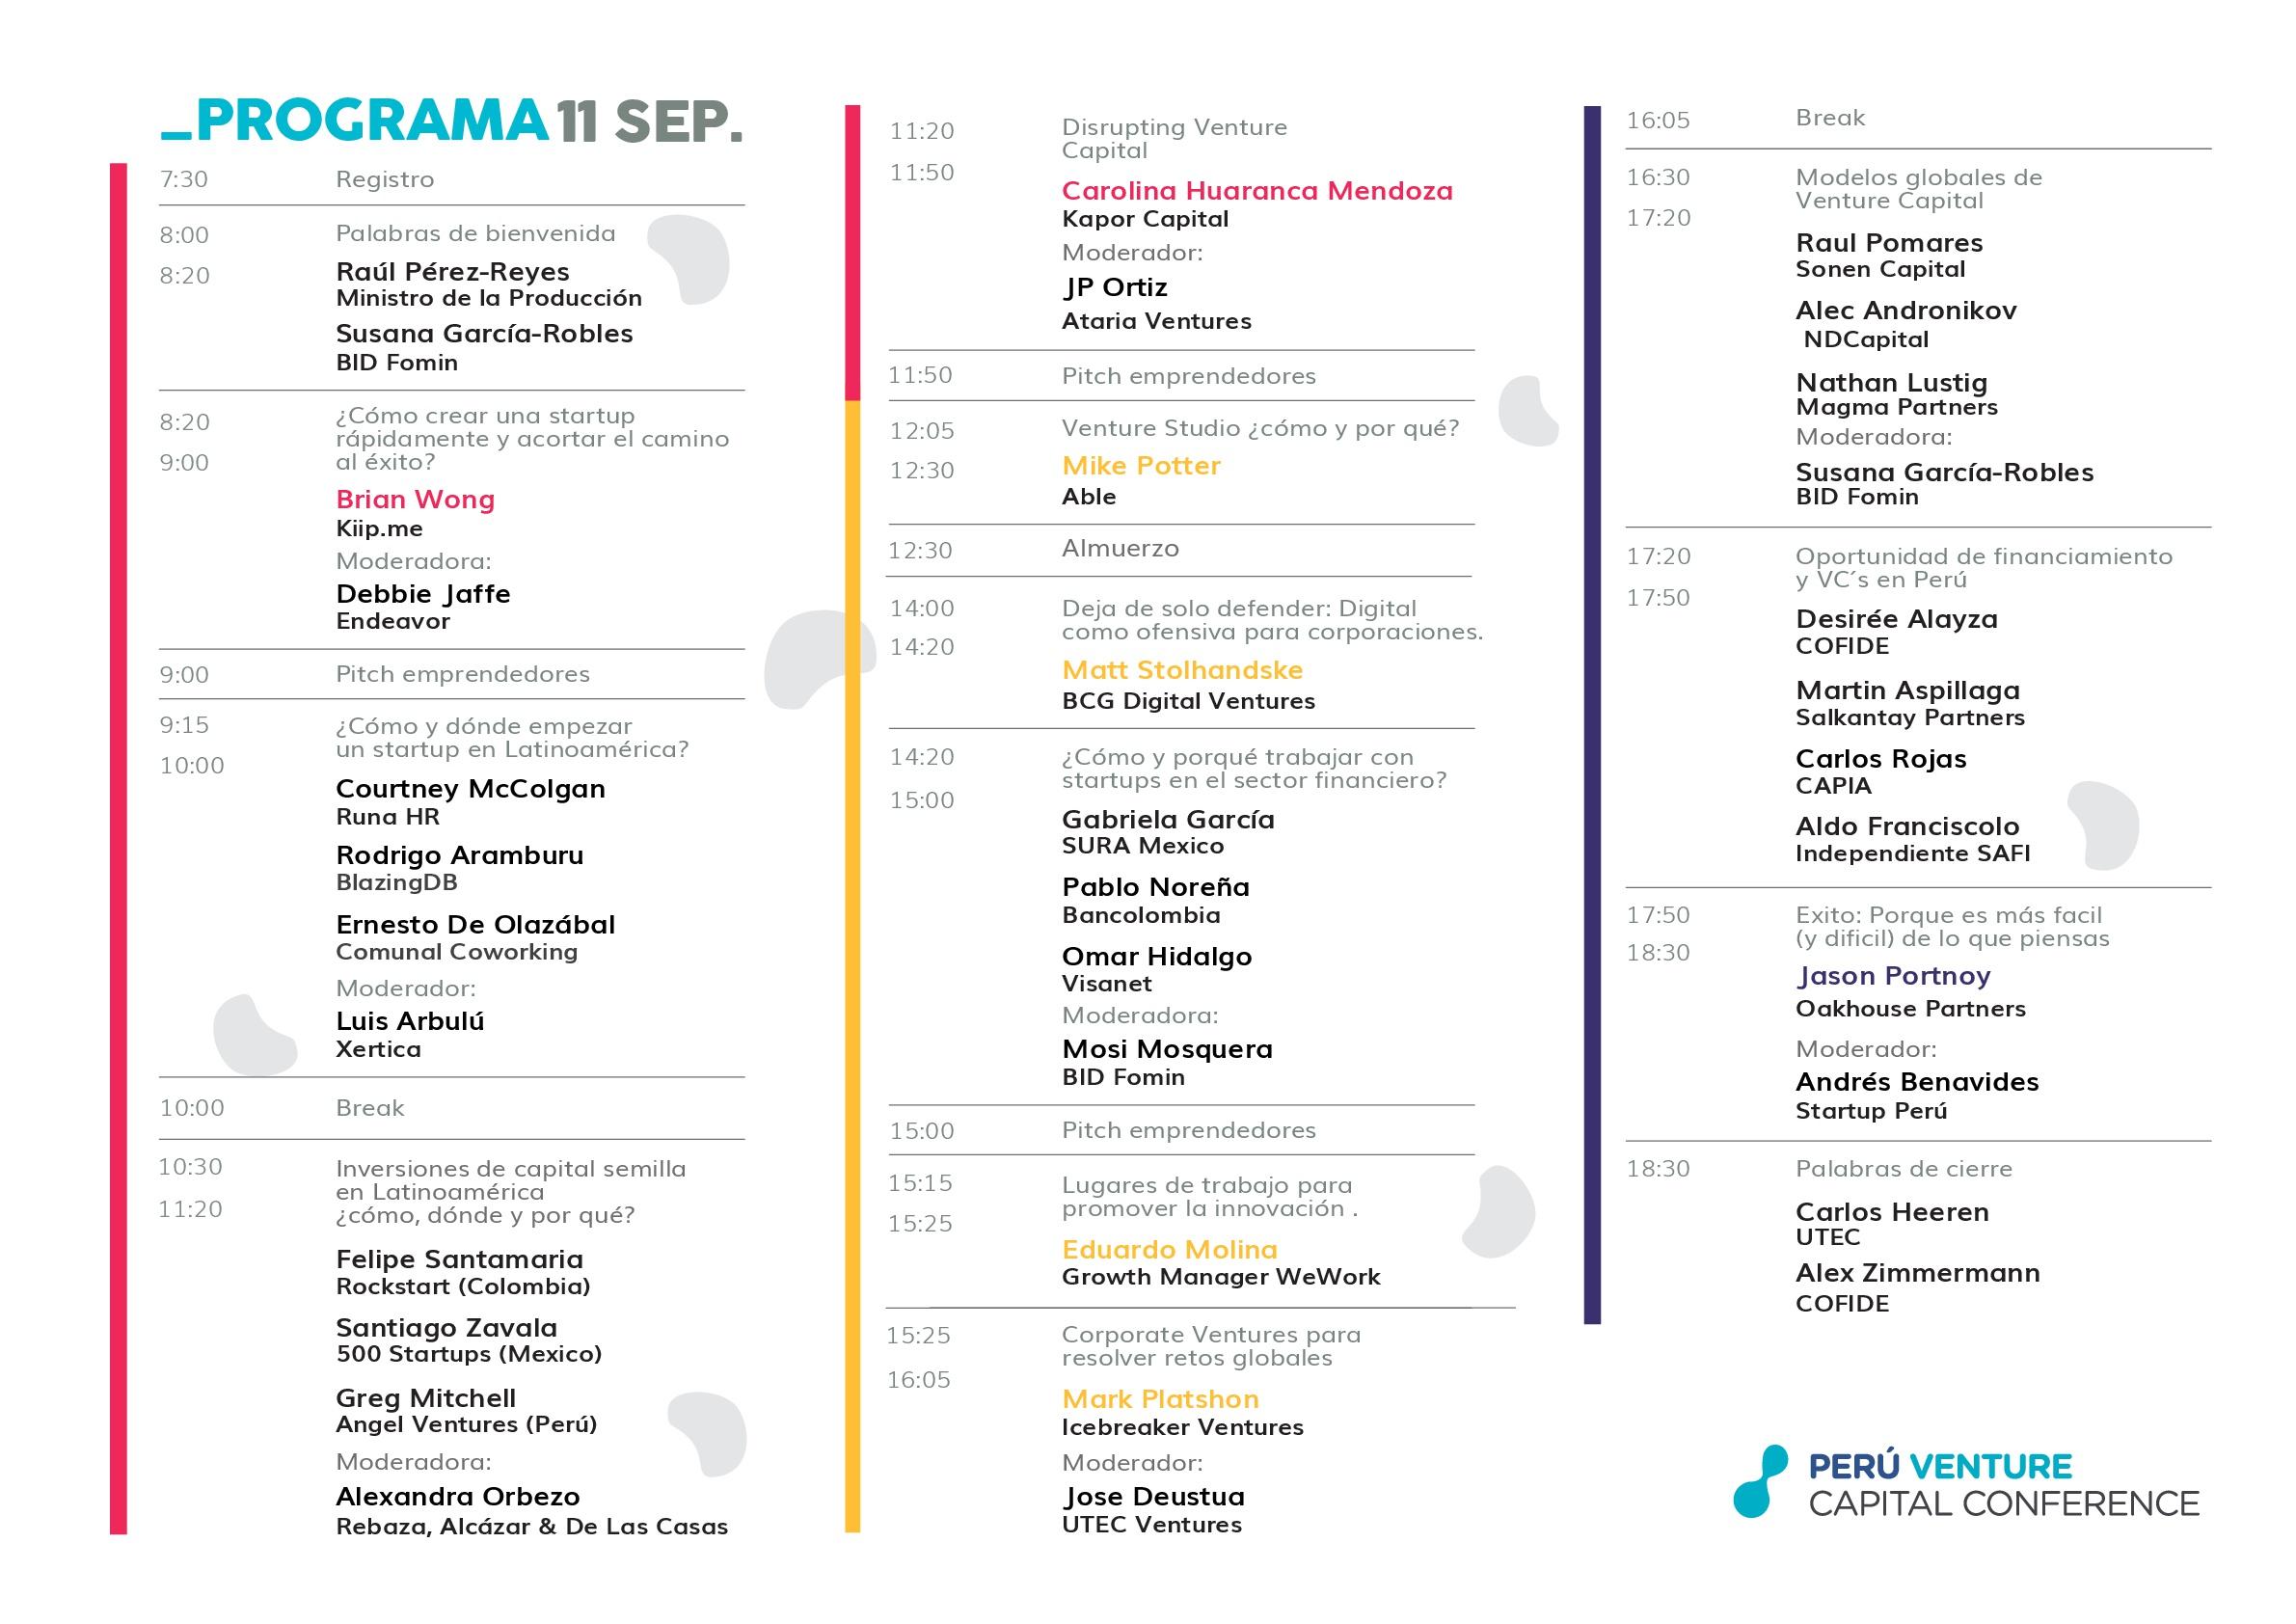 Peru-Venture-Capital-Conference---Programa-004.jpg